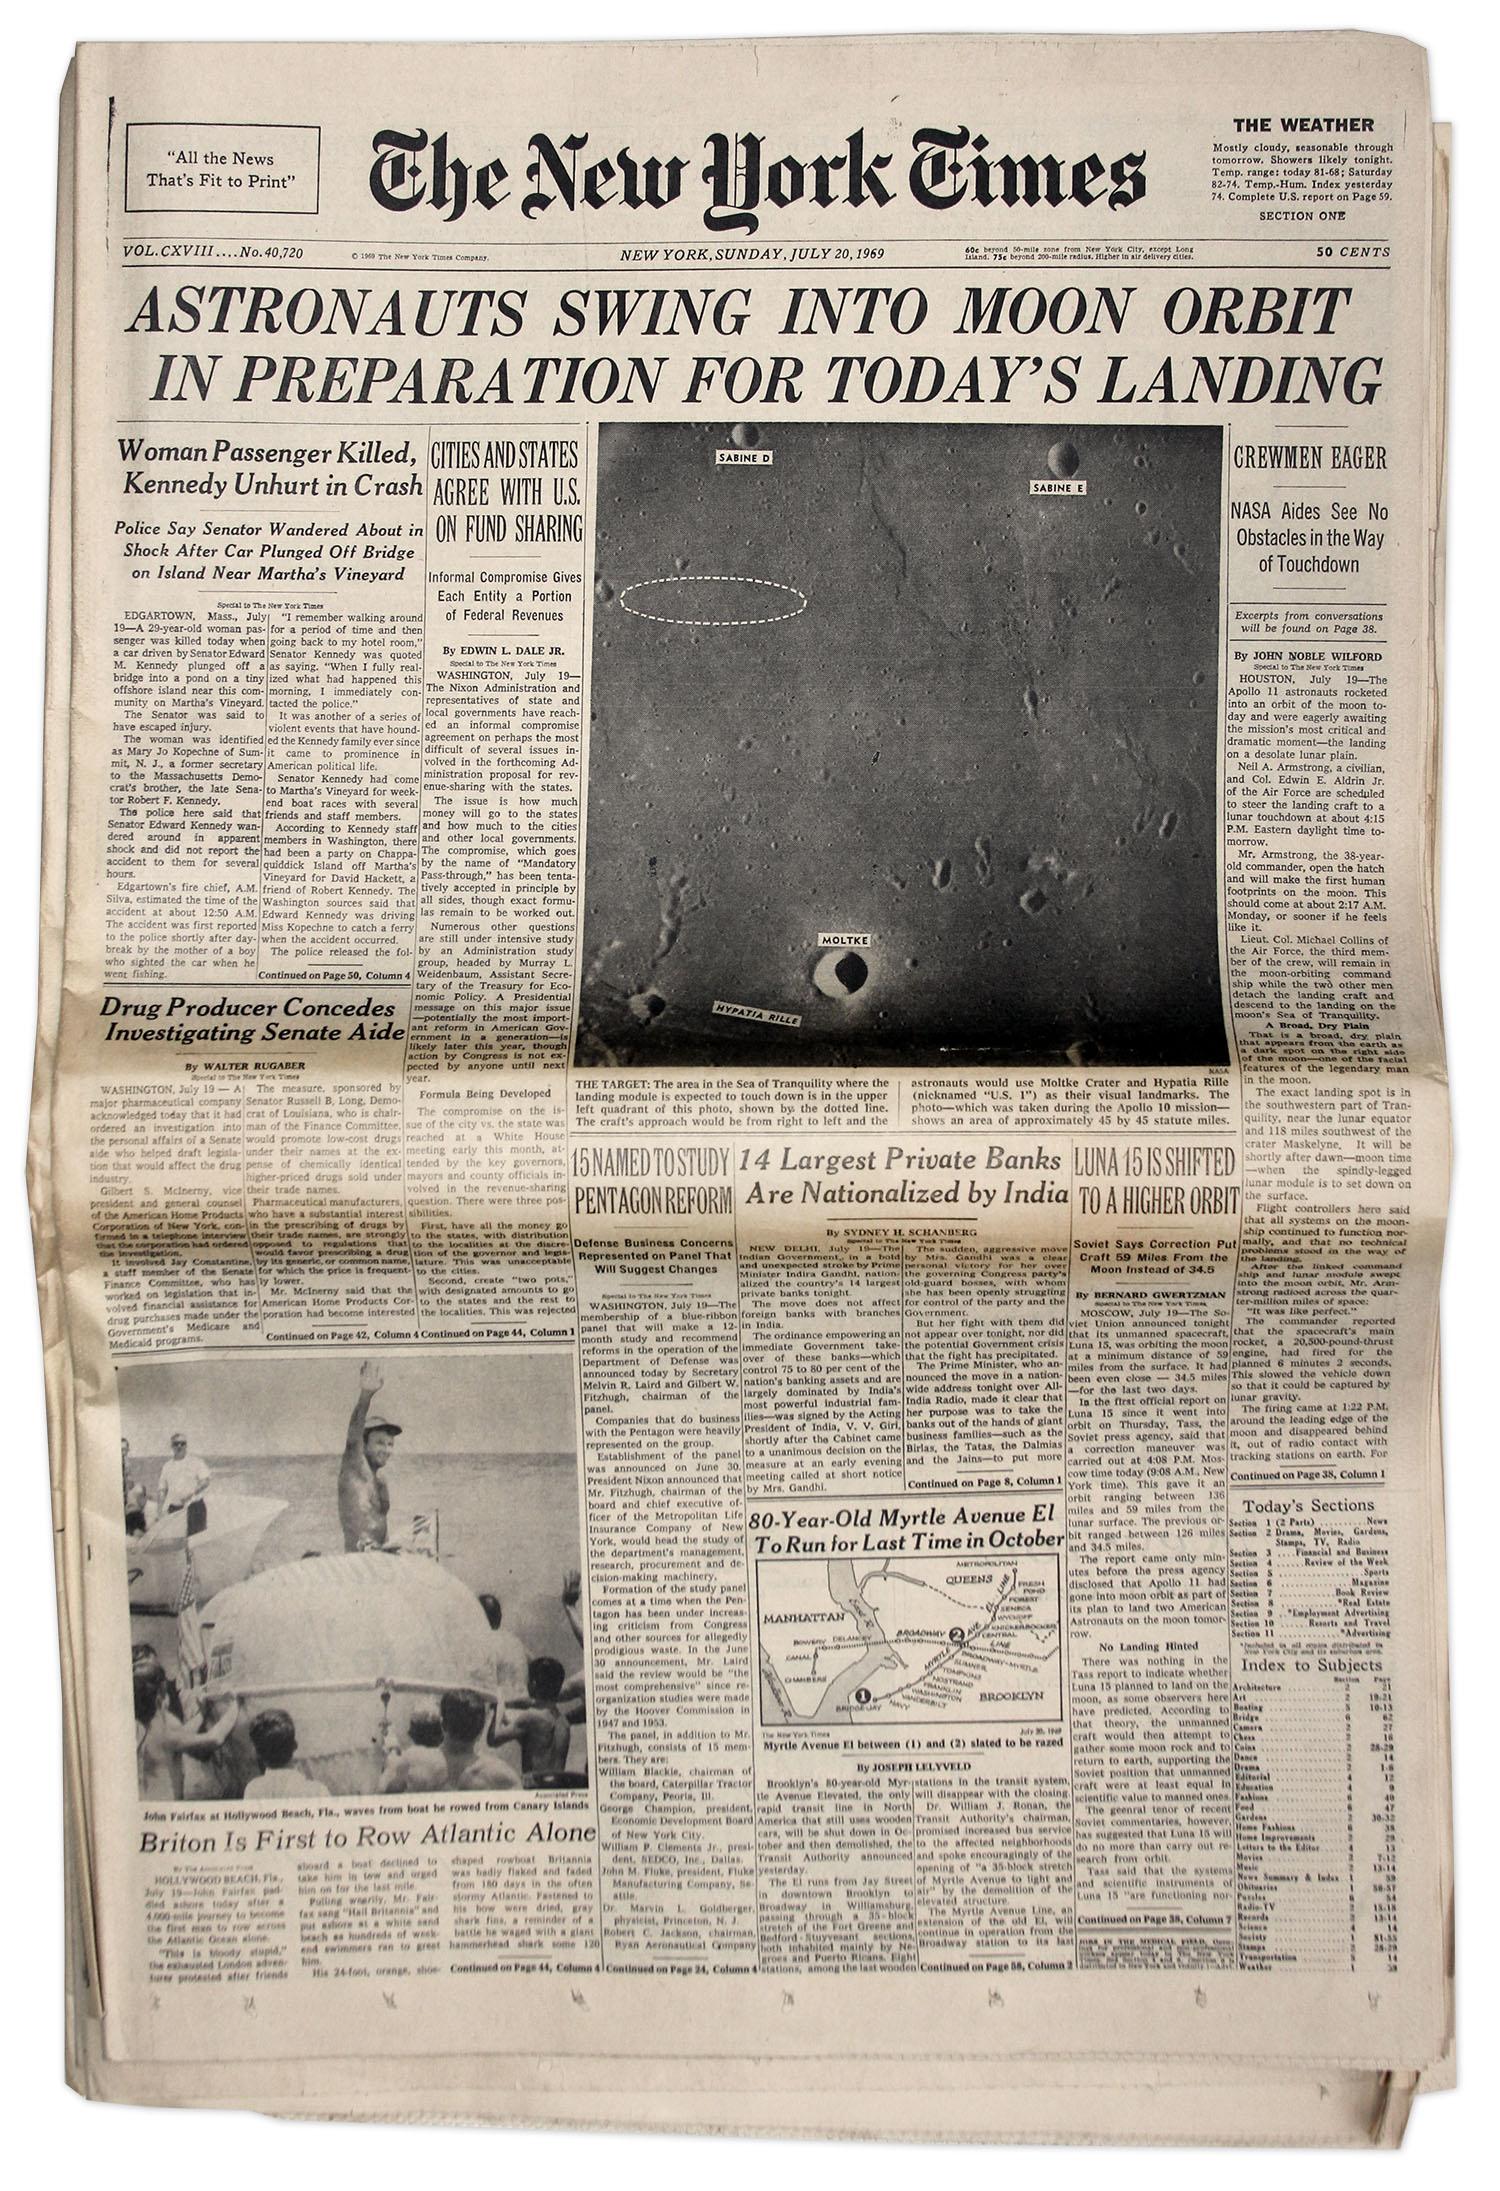 mars landing new york times - photo #27